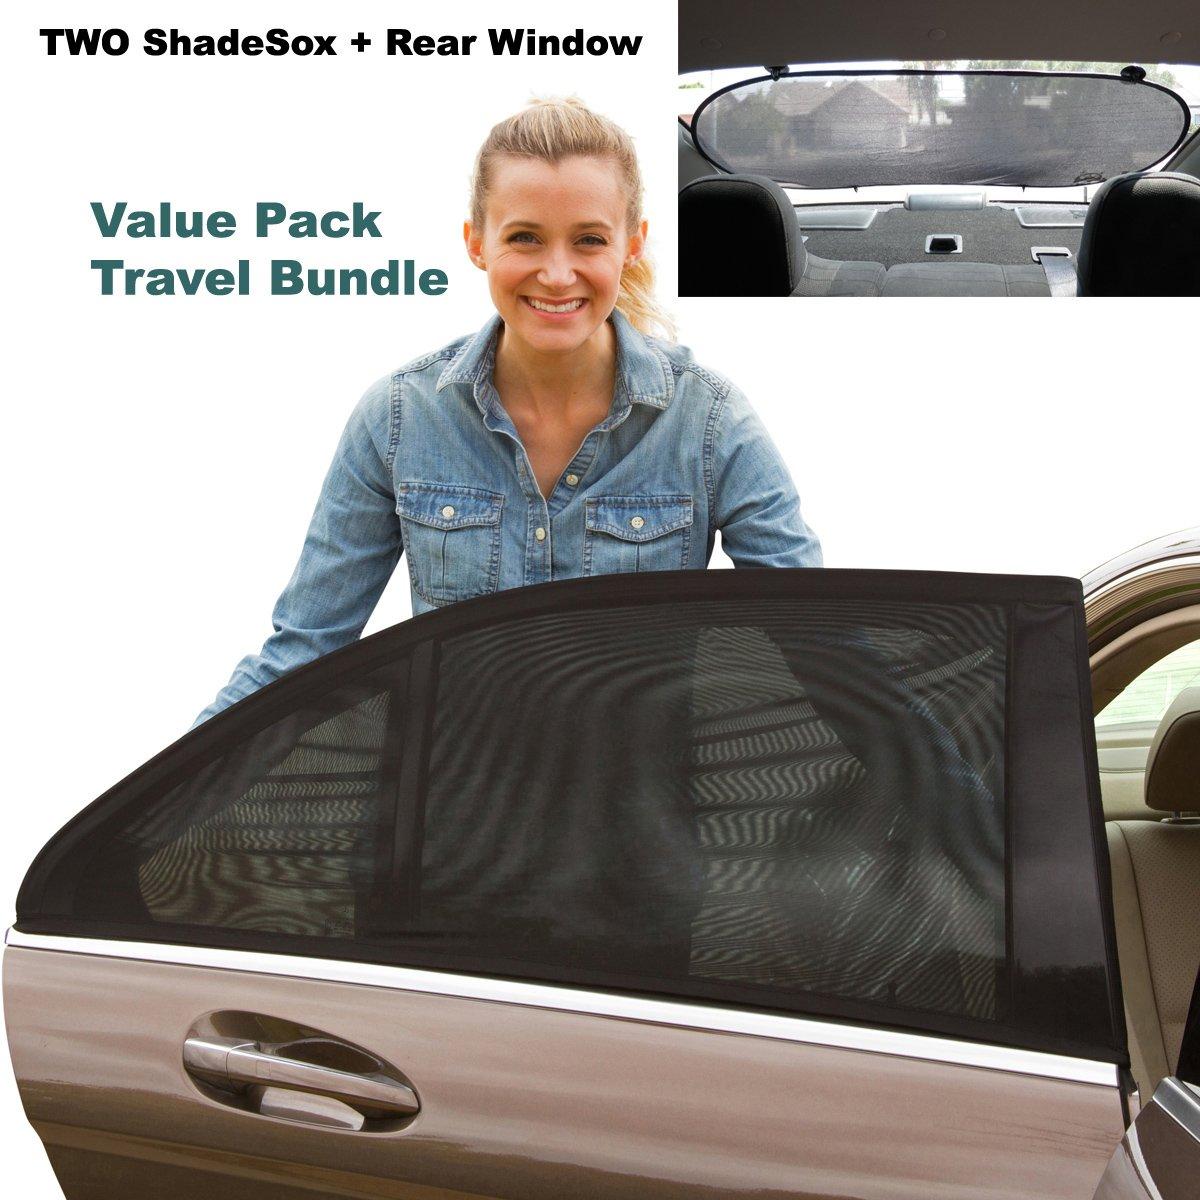 Covercraft UV10787BL Blue Metallic UVS 100 Custom Fit Sunscreen for Select Lexus SC430 Models Laminate Material 1 Pack